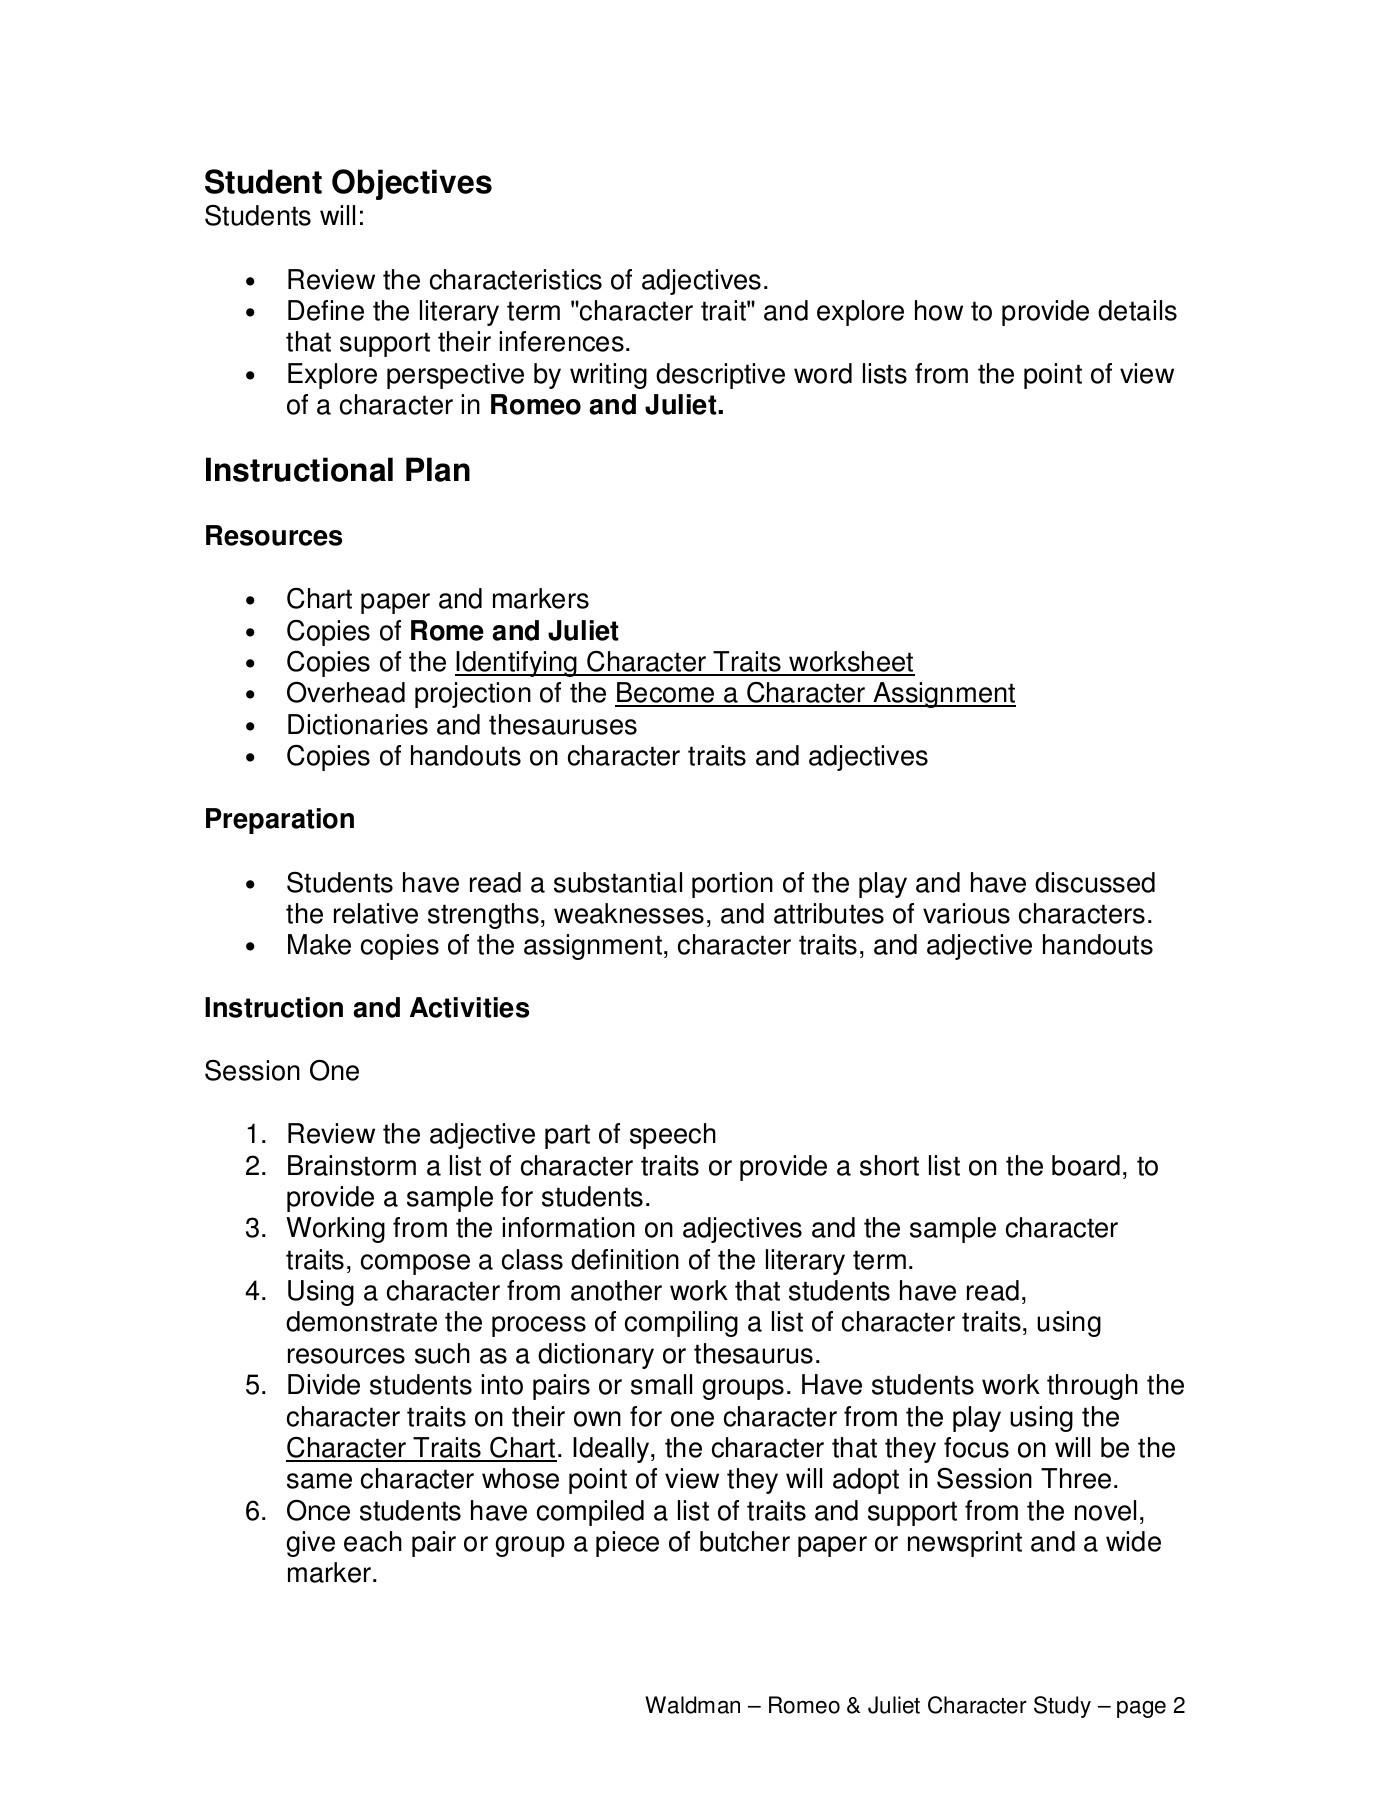 Character Traits Worksheet Pdf Romeo and Juliet Character Traits Marsha Waldman Pages 1